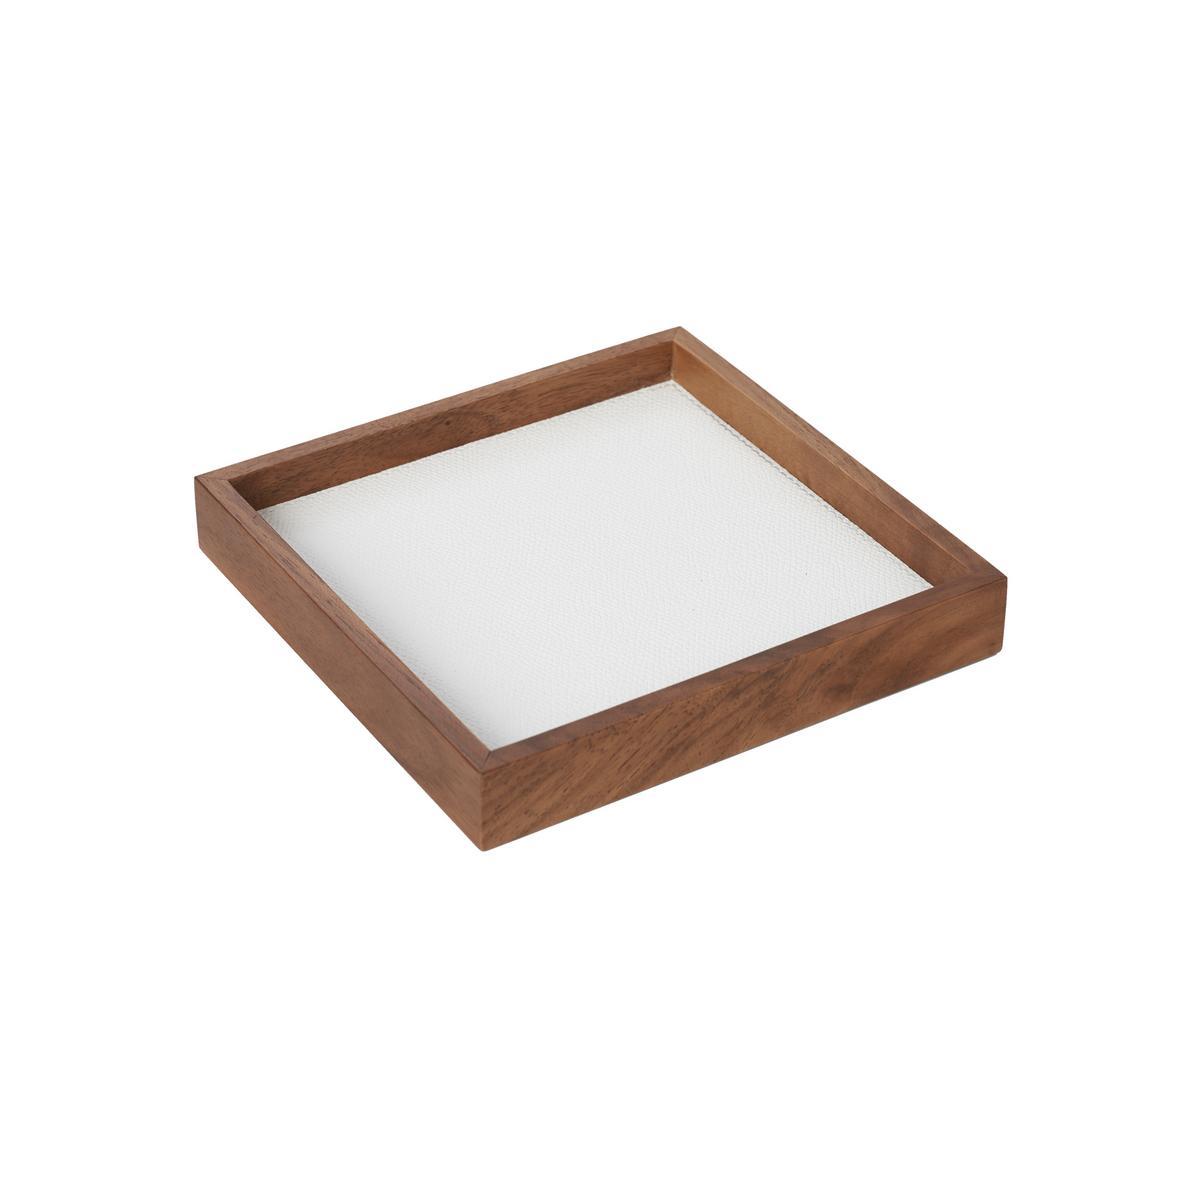 GioBagnara Phorma Rectangular tray square small white